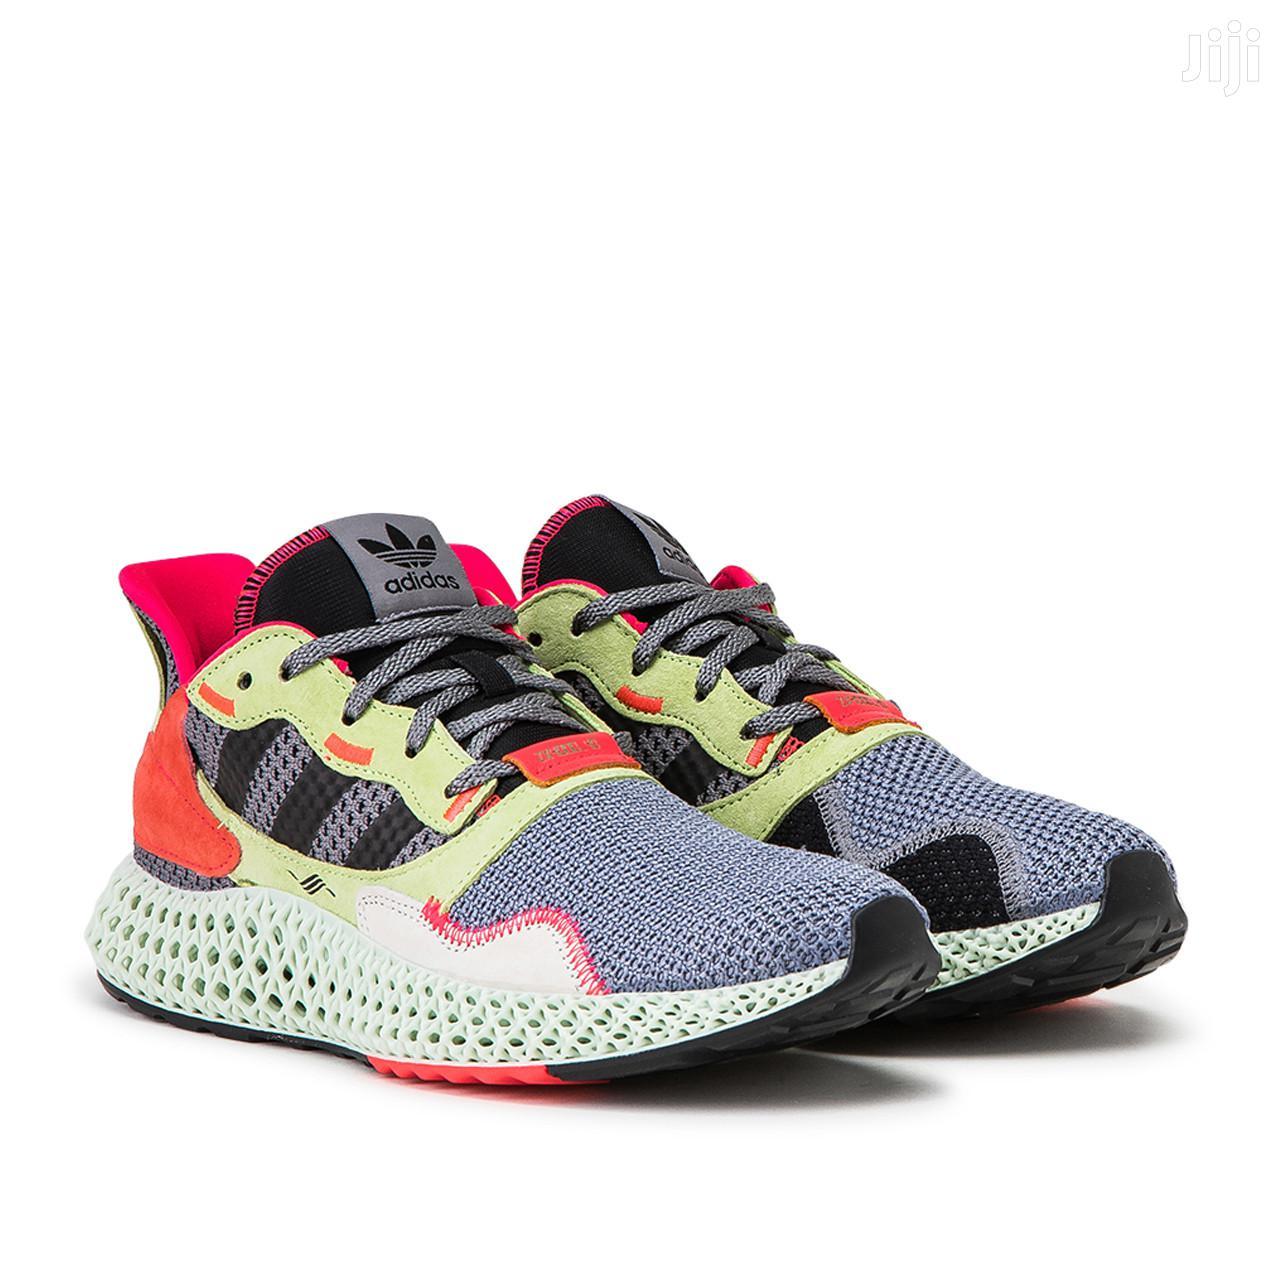 Adidas Alphaedge 4d Originals | Shoes for sale in Accra Metropolitan, Greater Accra, Ghana